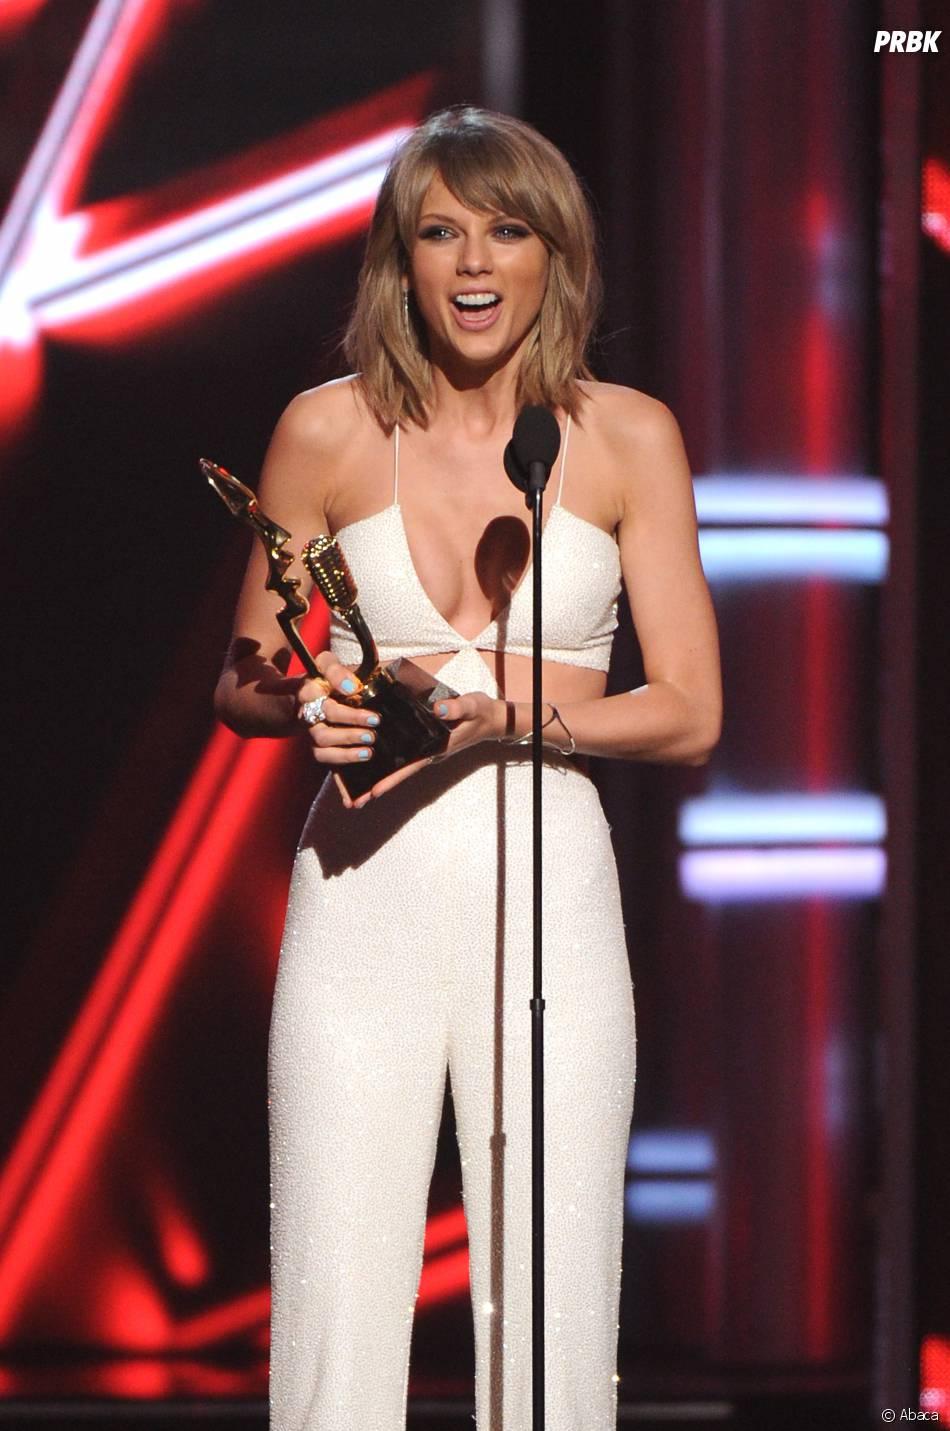 Taylor Swift sexy en blanc et grande gagnante des Billboard Music Awards 2015, le 17 mai 2015 à Las Vegas